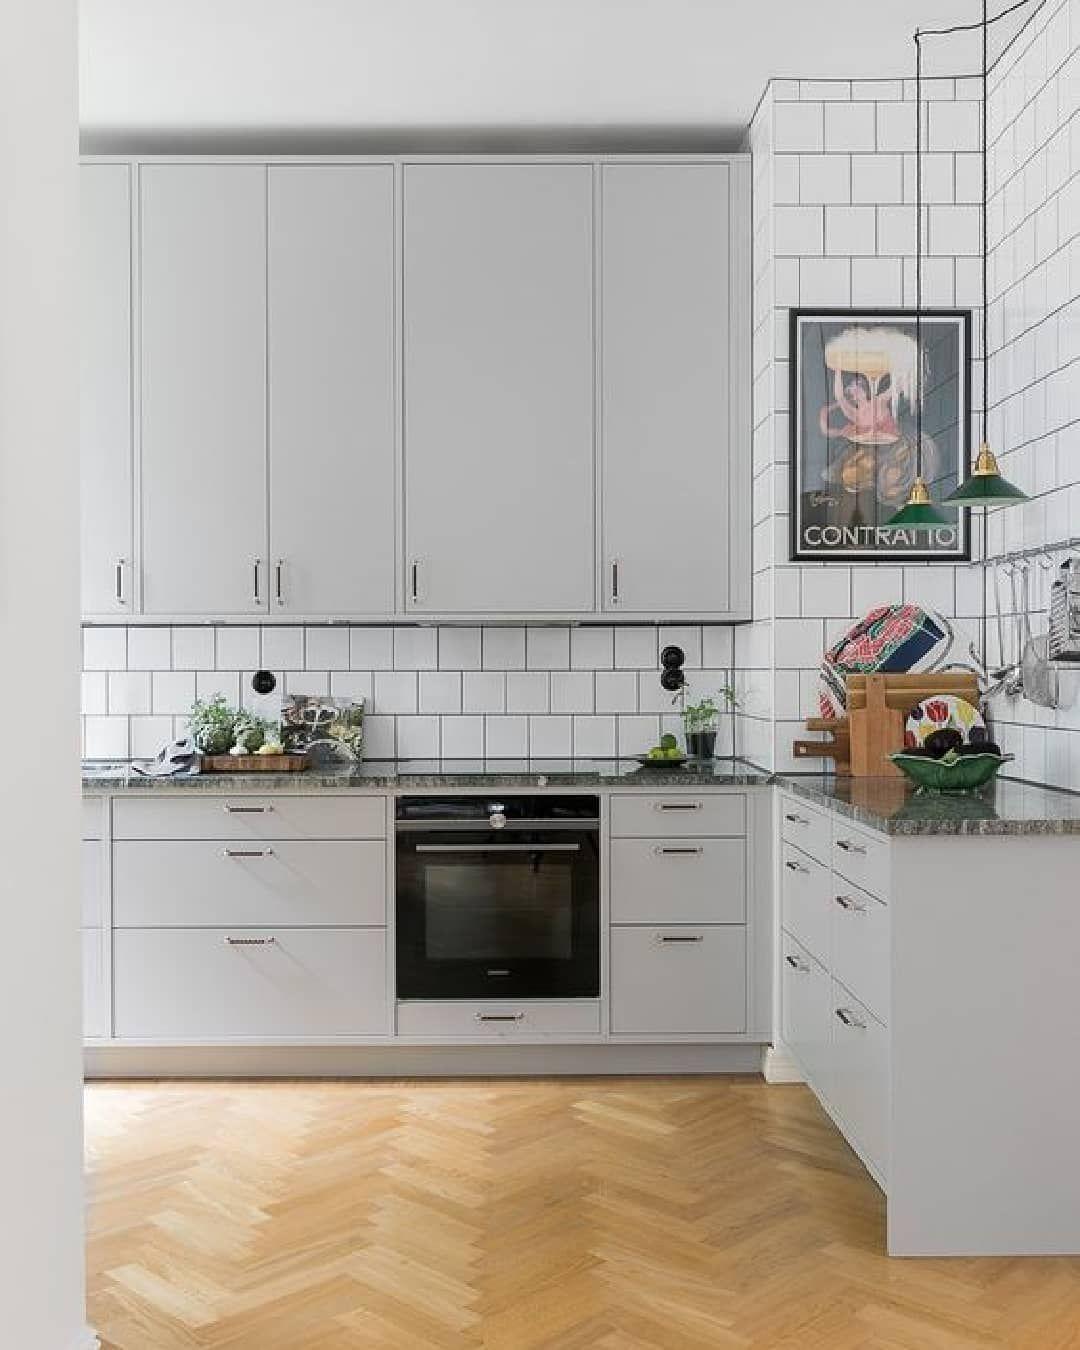 50 Off Batch Bathroom Kitchen Stone Benchtops Batch Offers High Value Low Effort Home Renovations Where You Can O Koksdesign Inreda Kok Koksrenovering